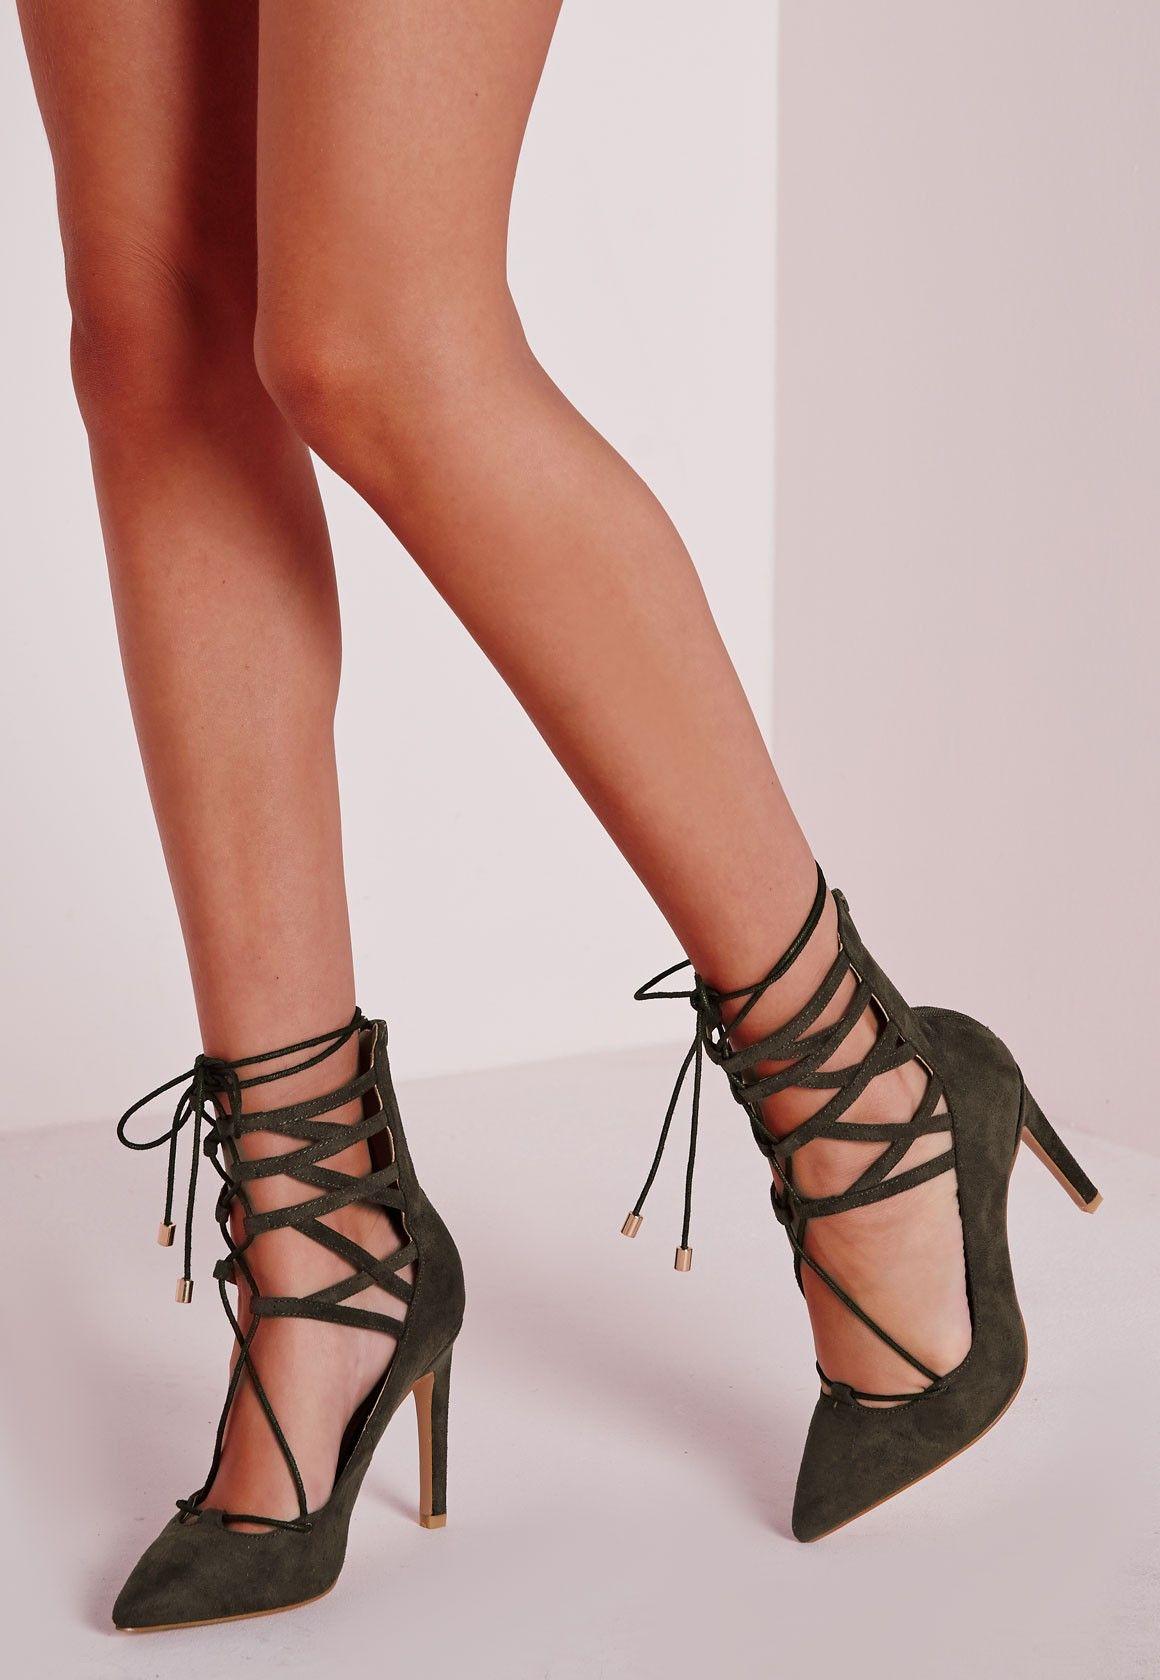 3ace0bcc15610 Missguided - Lace Up Stiletto Heeled Shoes Khaki